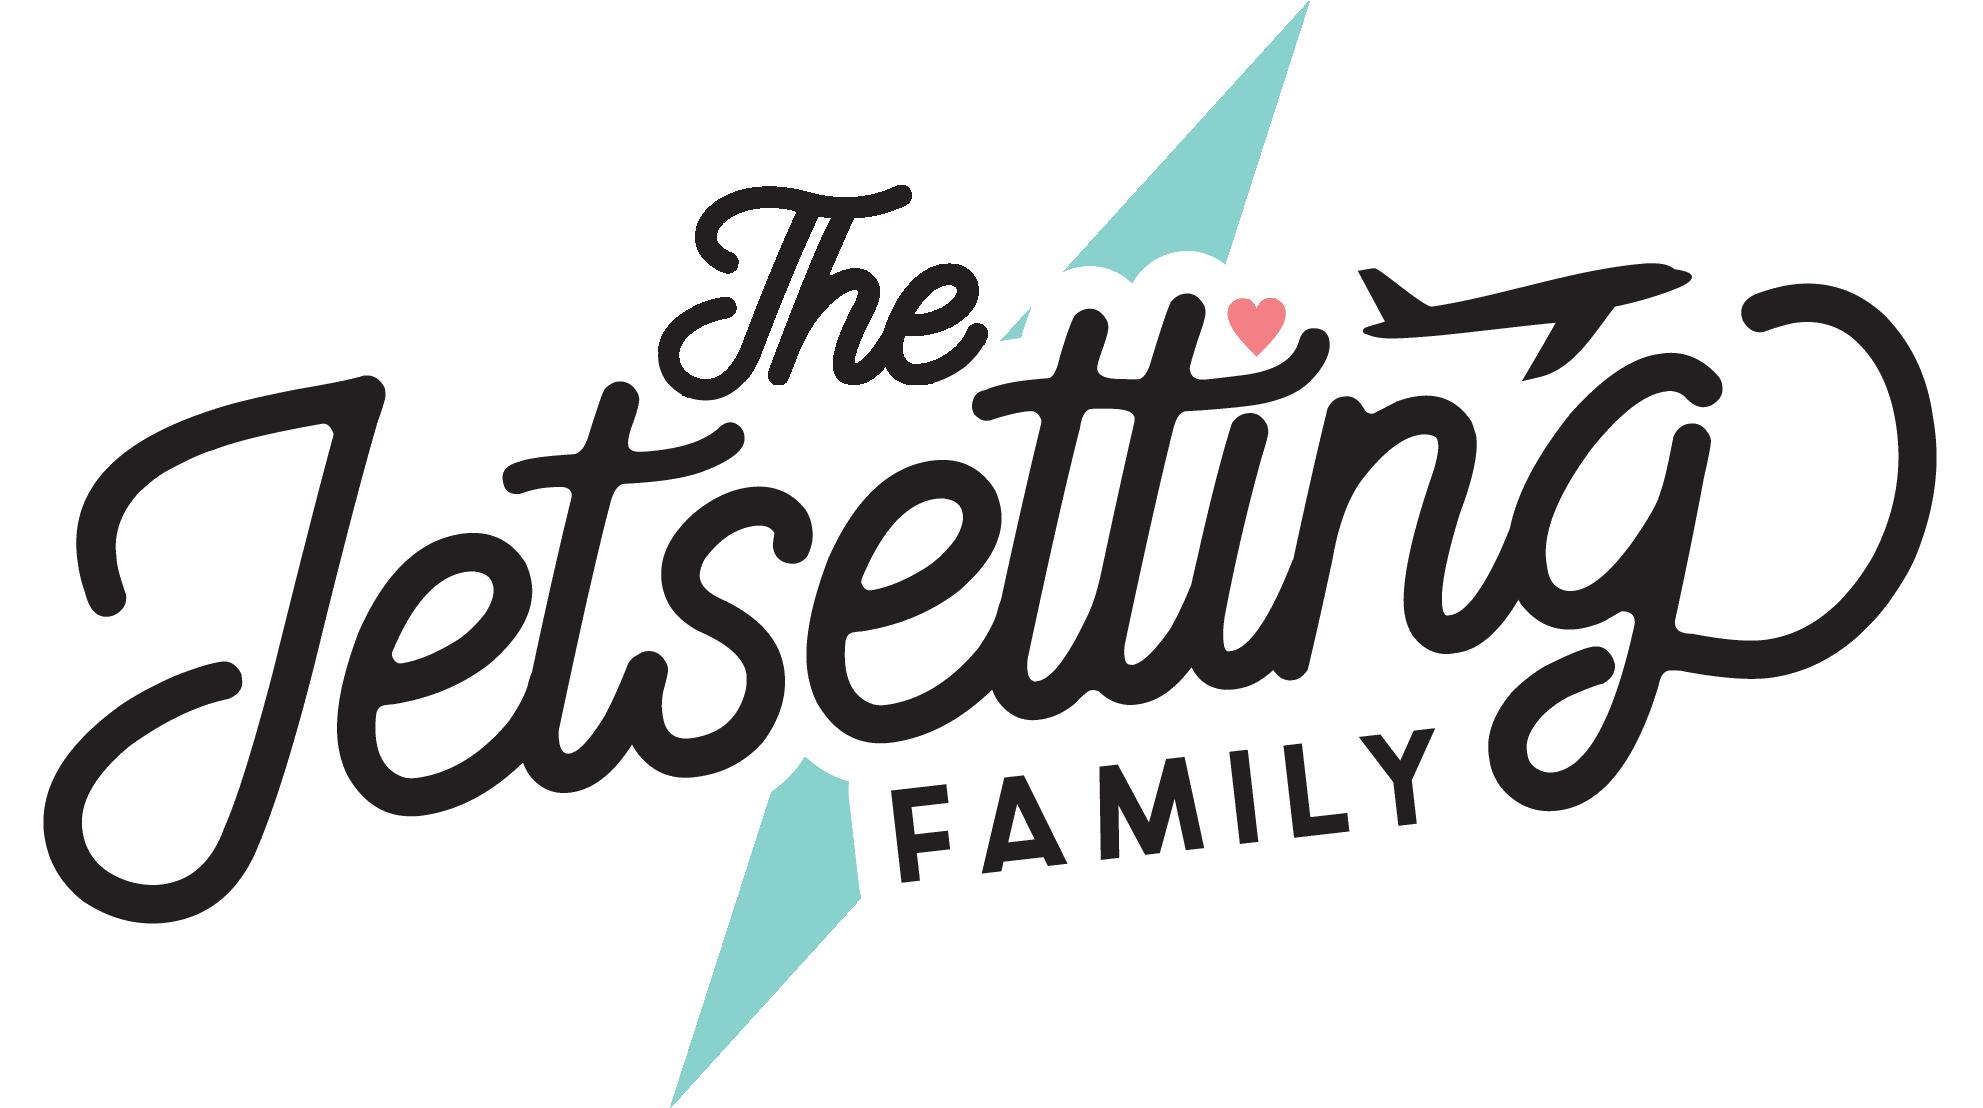 The Jetsetting Family